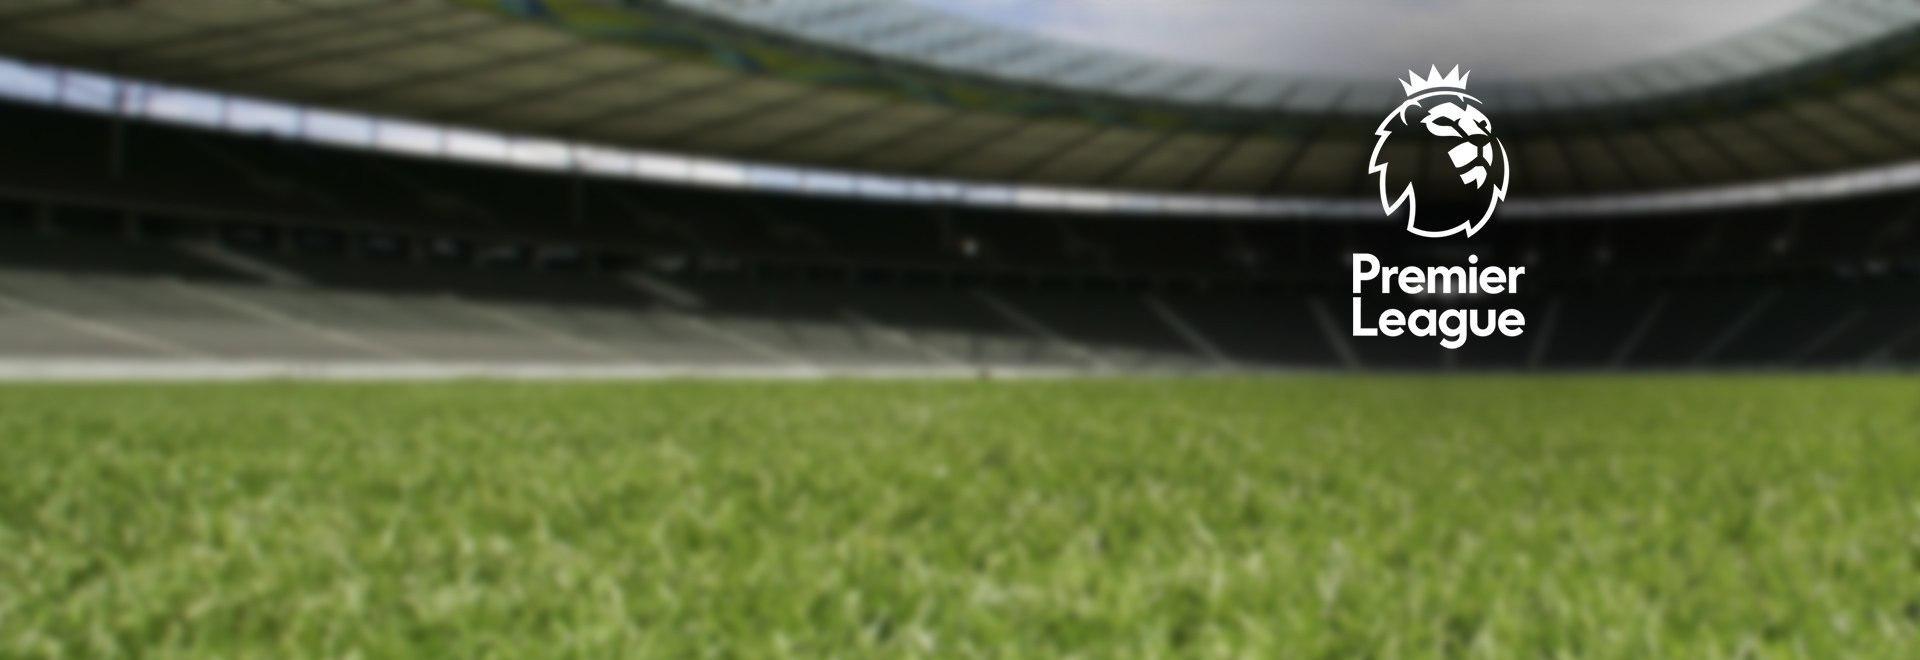 Fulham - Aston Villa. 3a g.